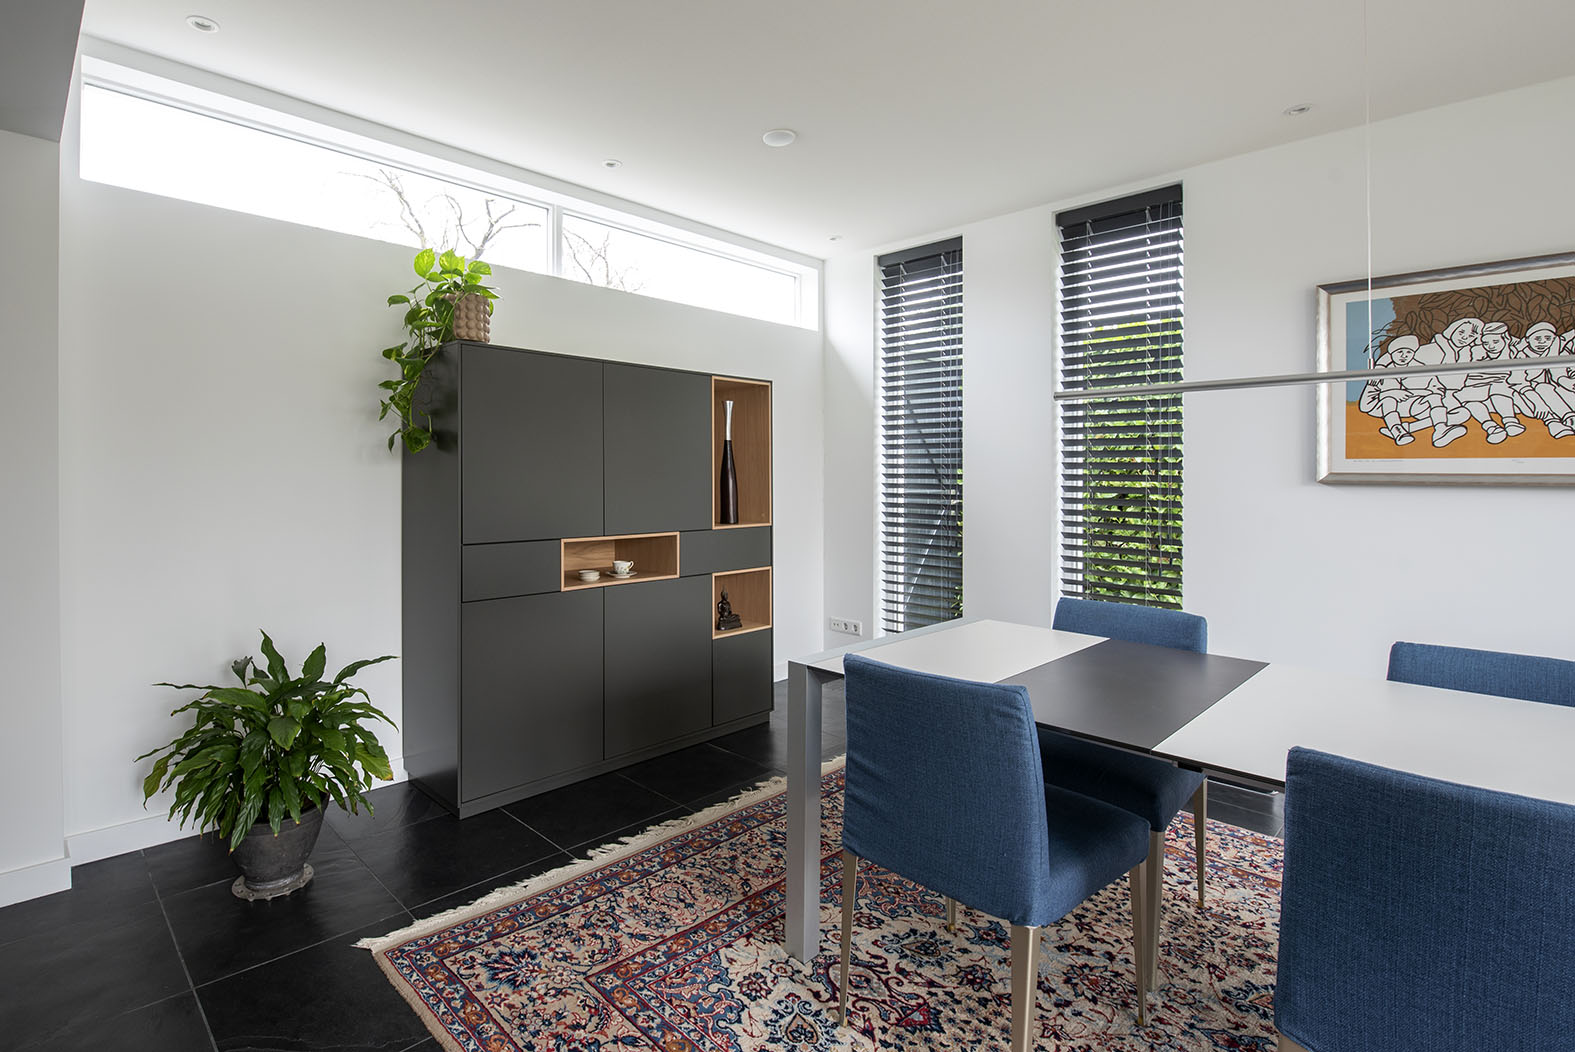 interieuradvies Den Bosch engelen eetkamer huiskamer stylen kast op maat maatwerk design meubels styling interieurontwerp